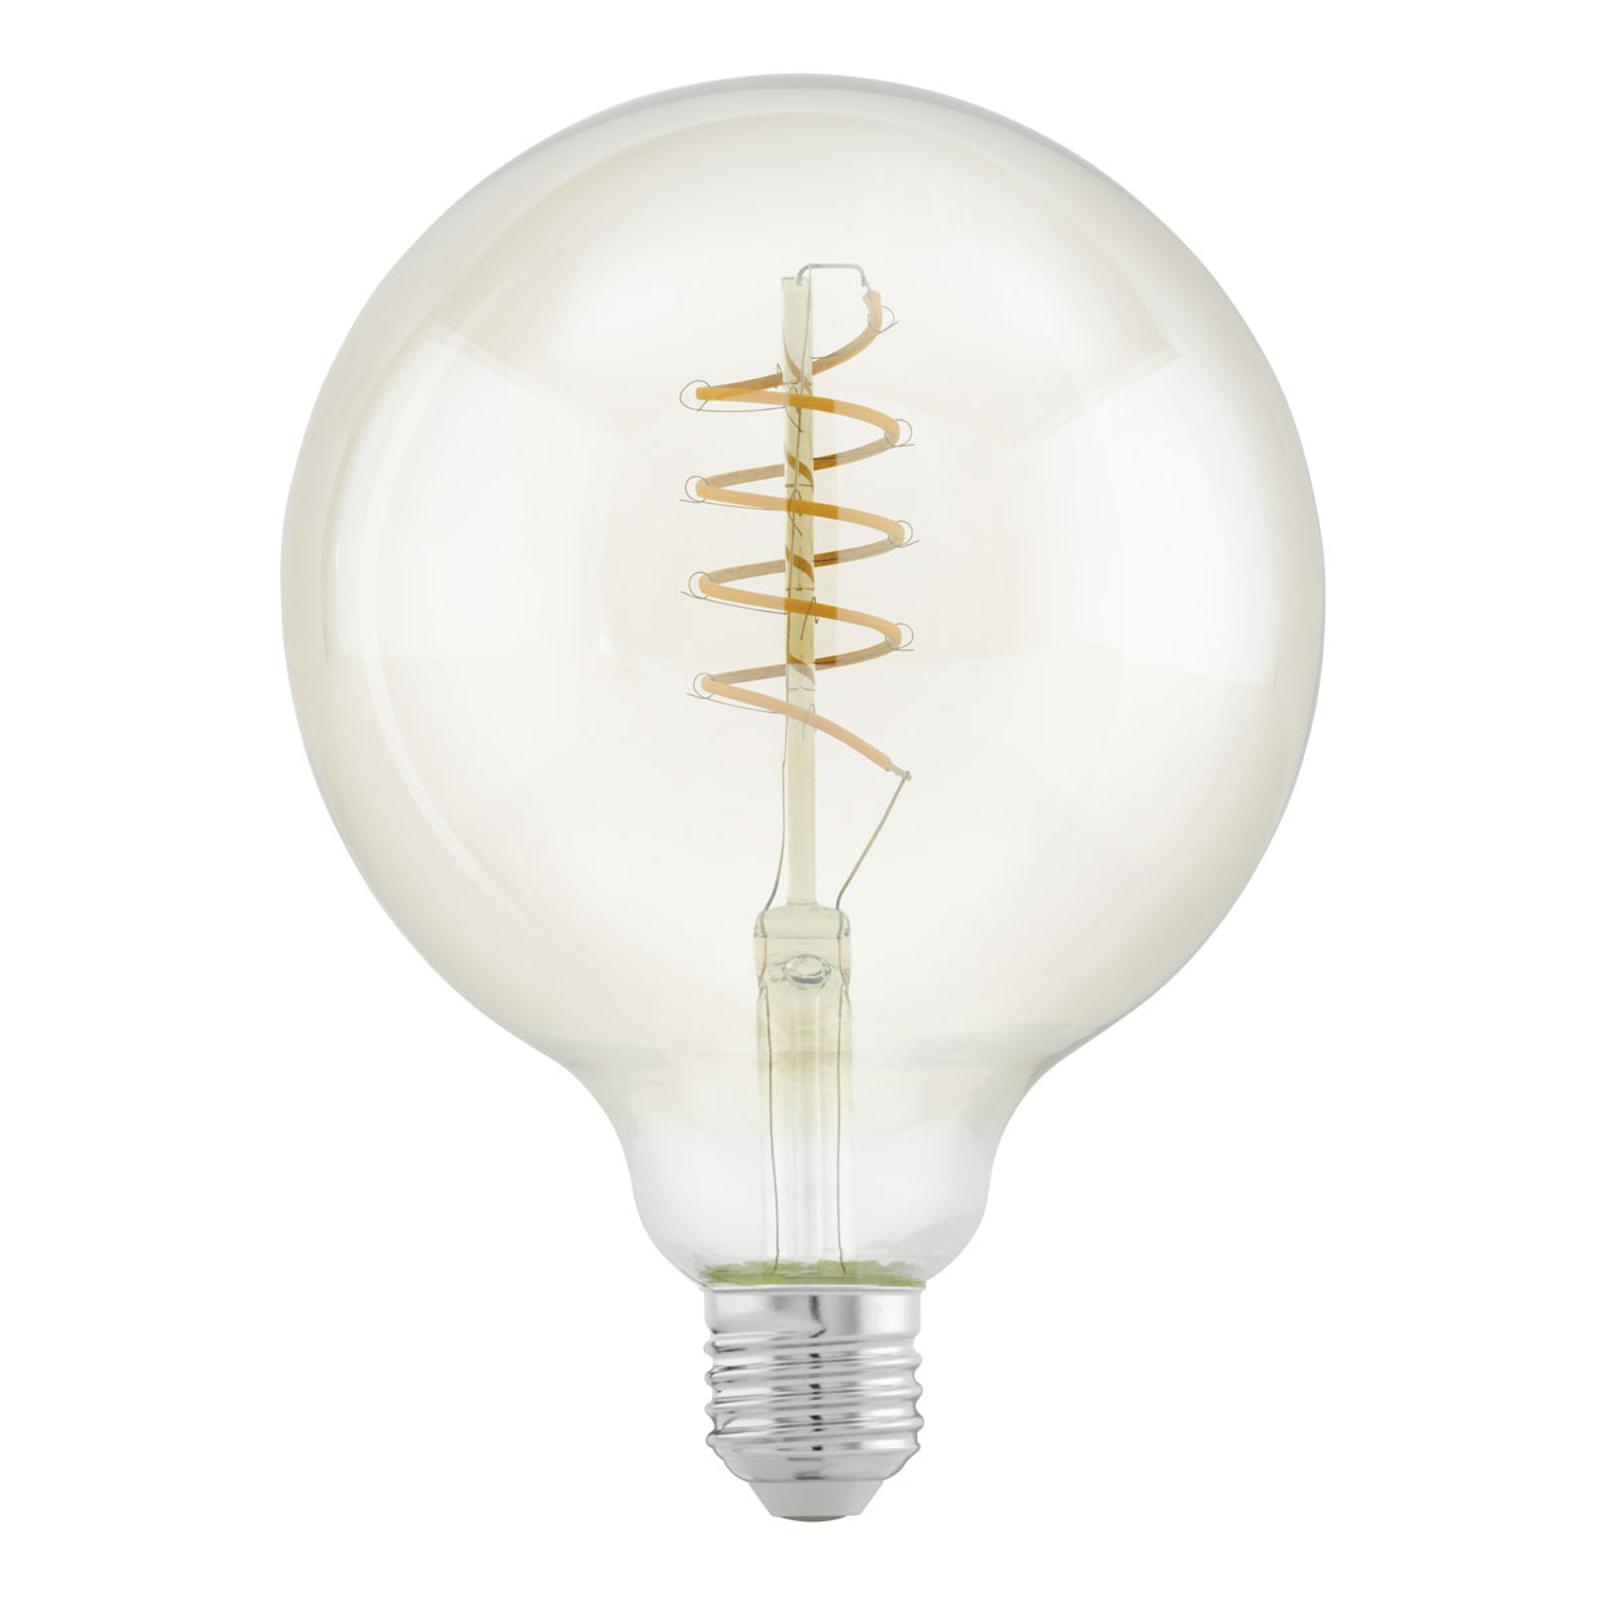 LED-Globelampe E27 G125 4W Spiral, warmweiß, klar